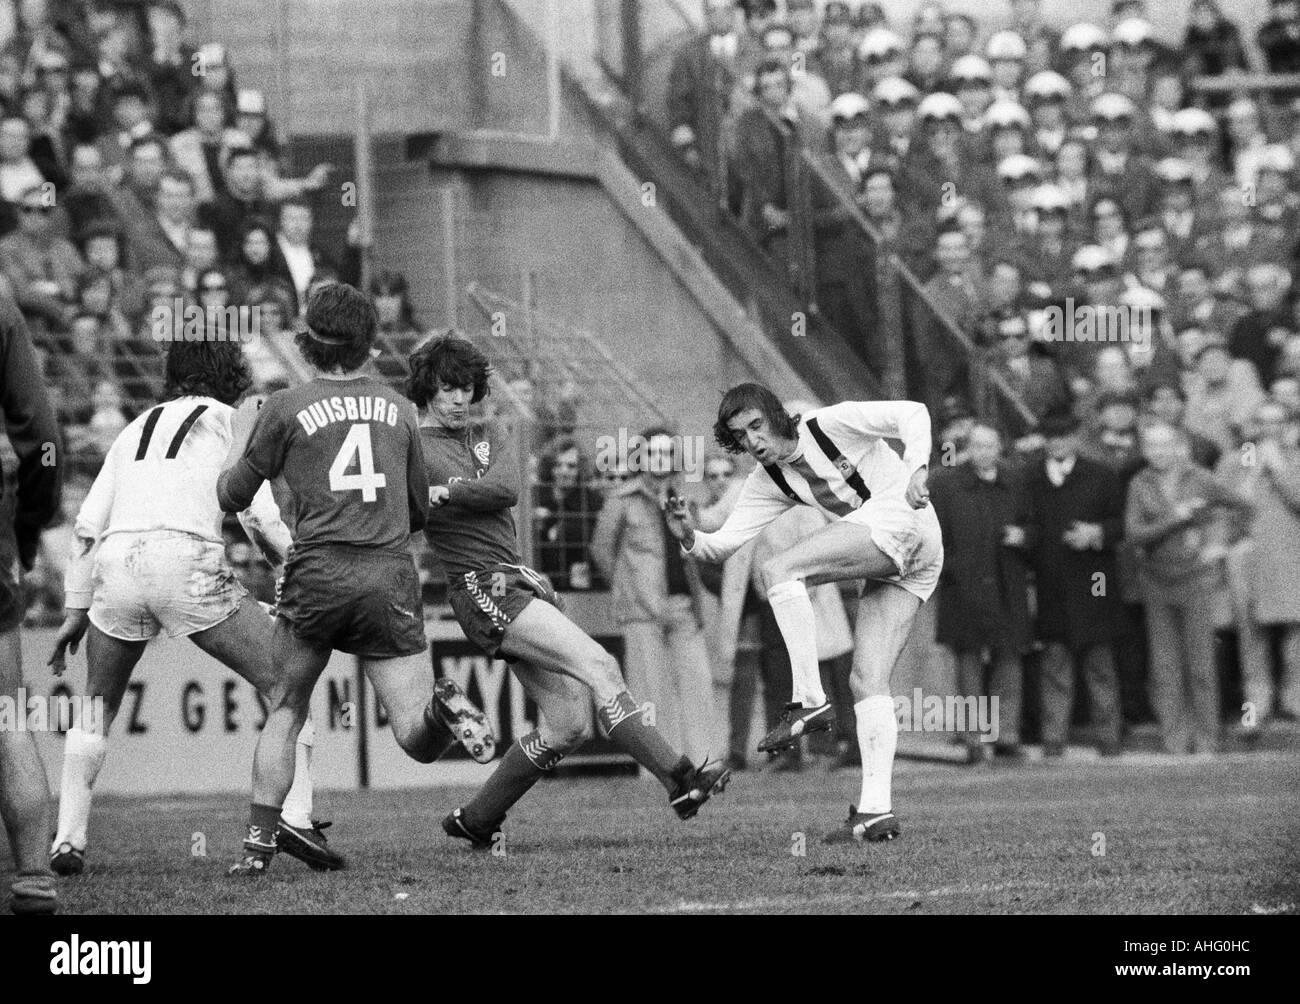 football, Bundesliga, 1973/1974, Boekelberg Stadium, Borussia Moenchengladbach versus MSV Duisburg 3:2, scene of the match, f.l.t.r. Jupp Heynckes (MG), a Duisburg player (4), Theo Buecker (MSV), Dietmar Danner (MG) - Stock Image